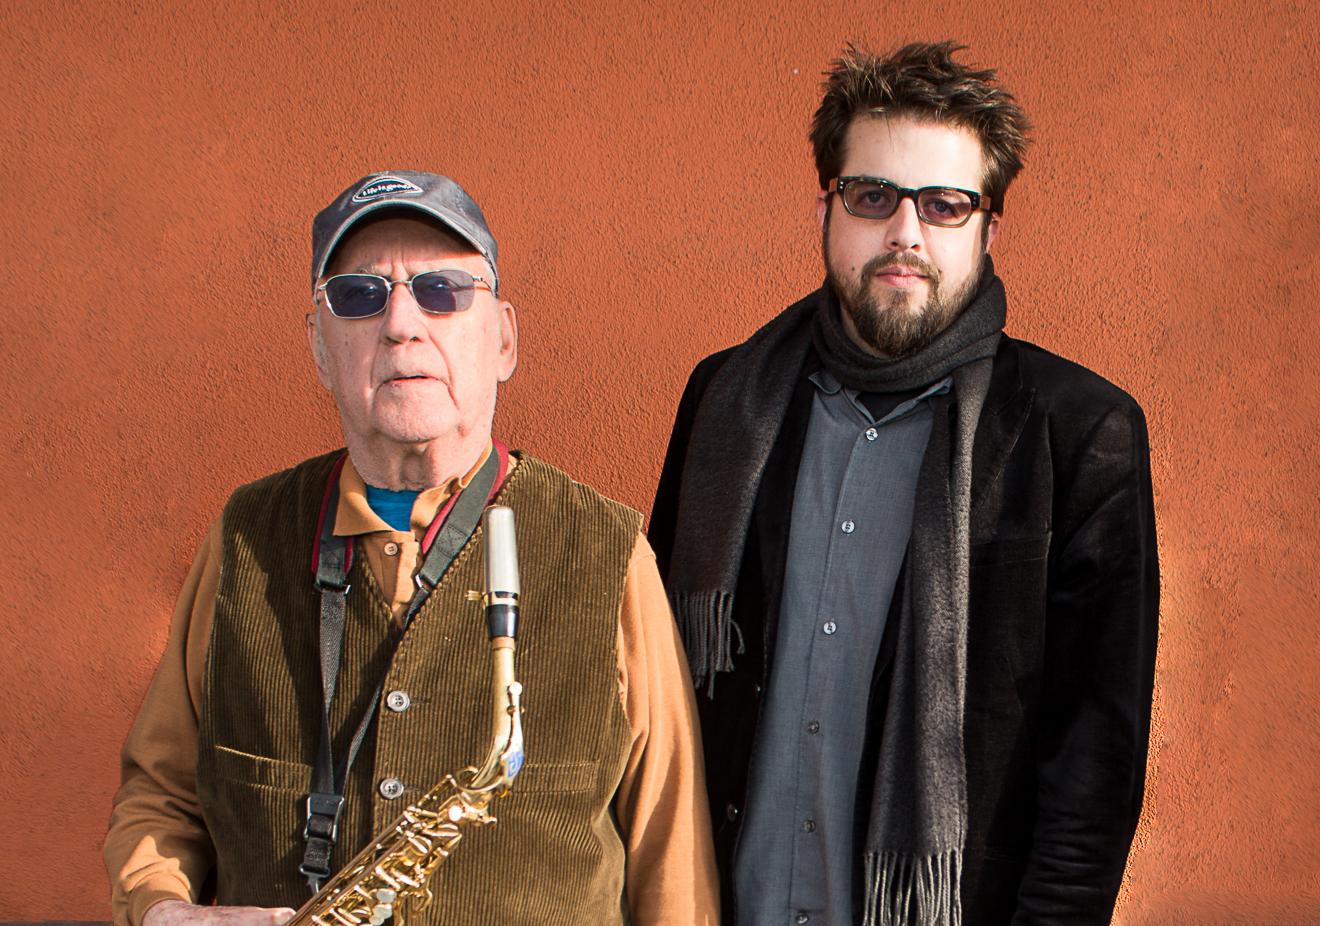 Jeff Denson & Lee Konitz, photo by James Knox